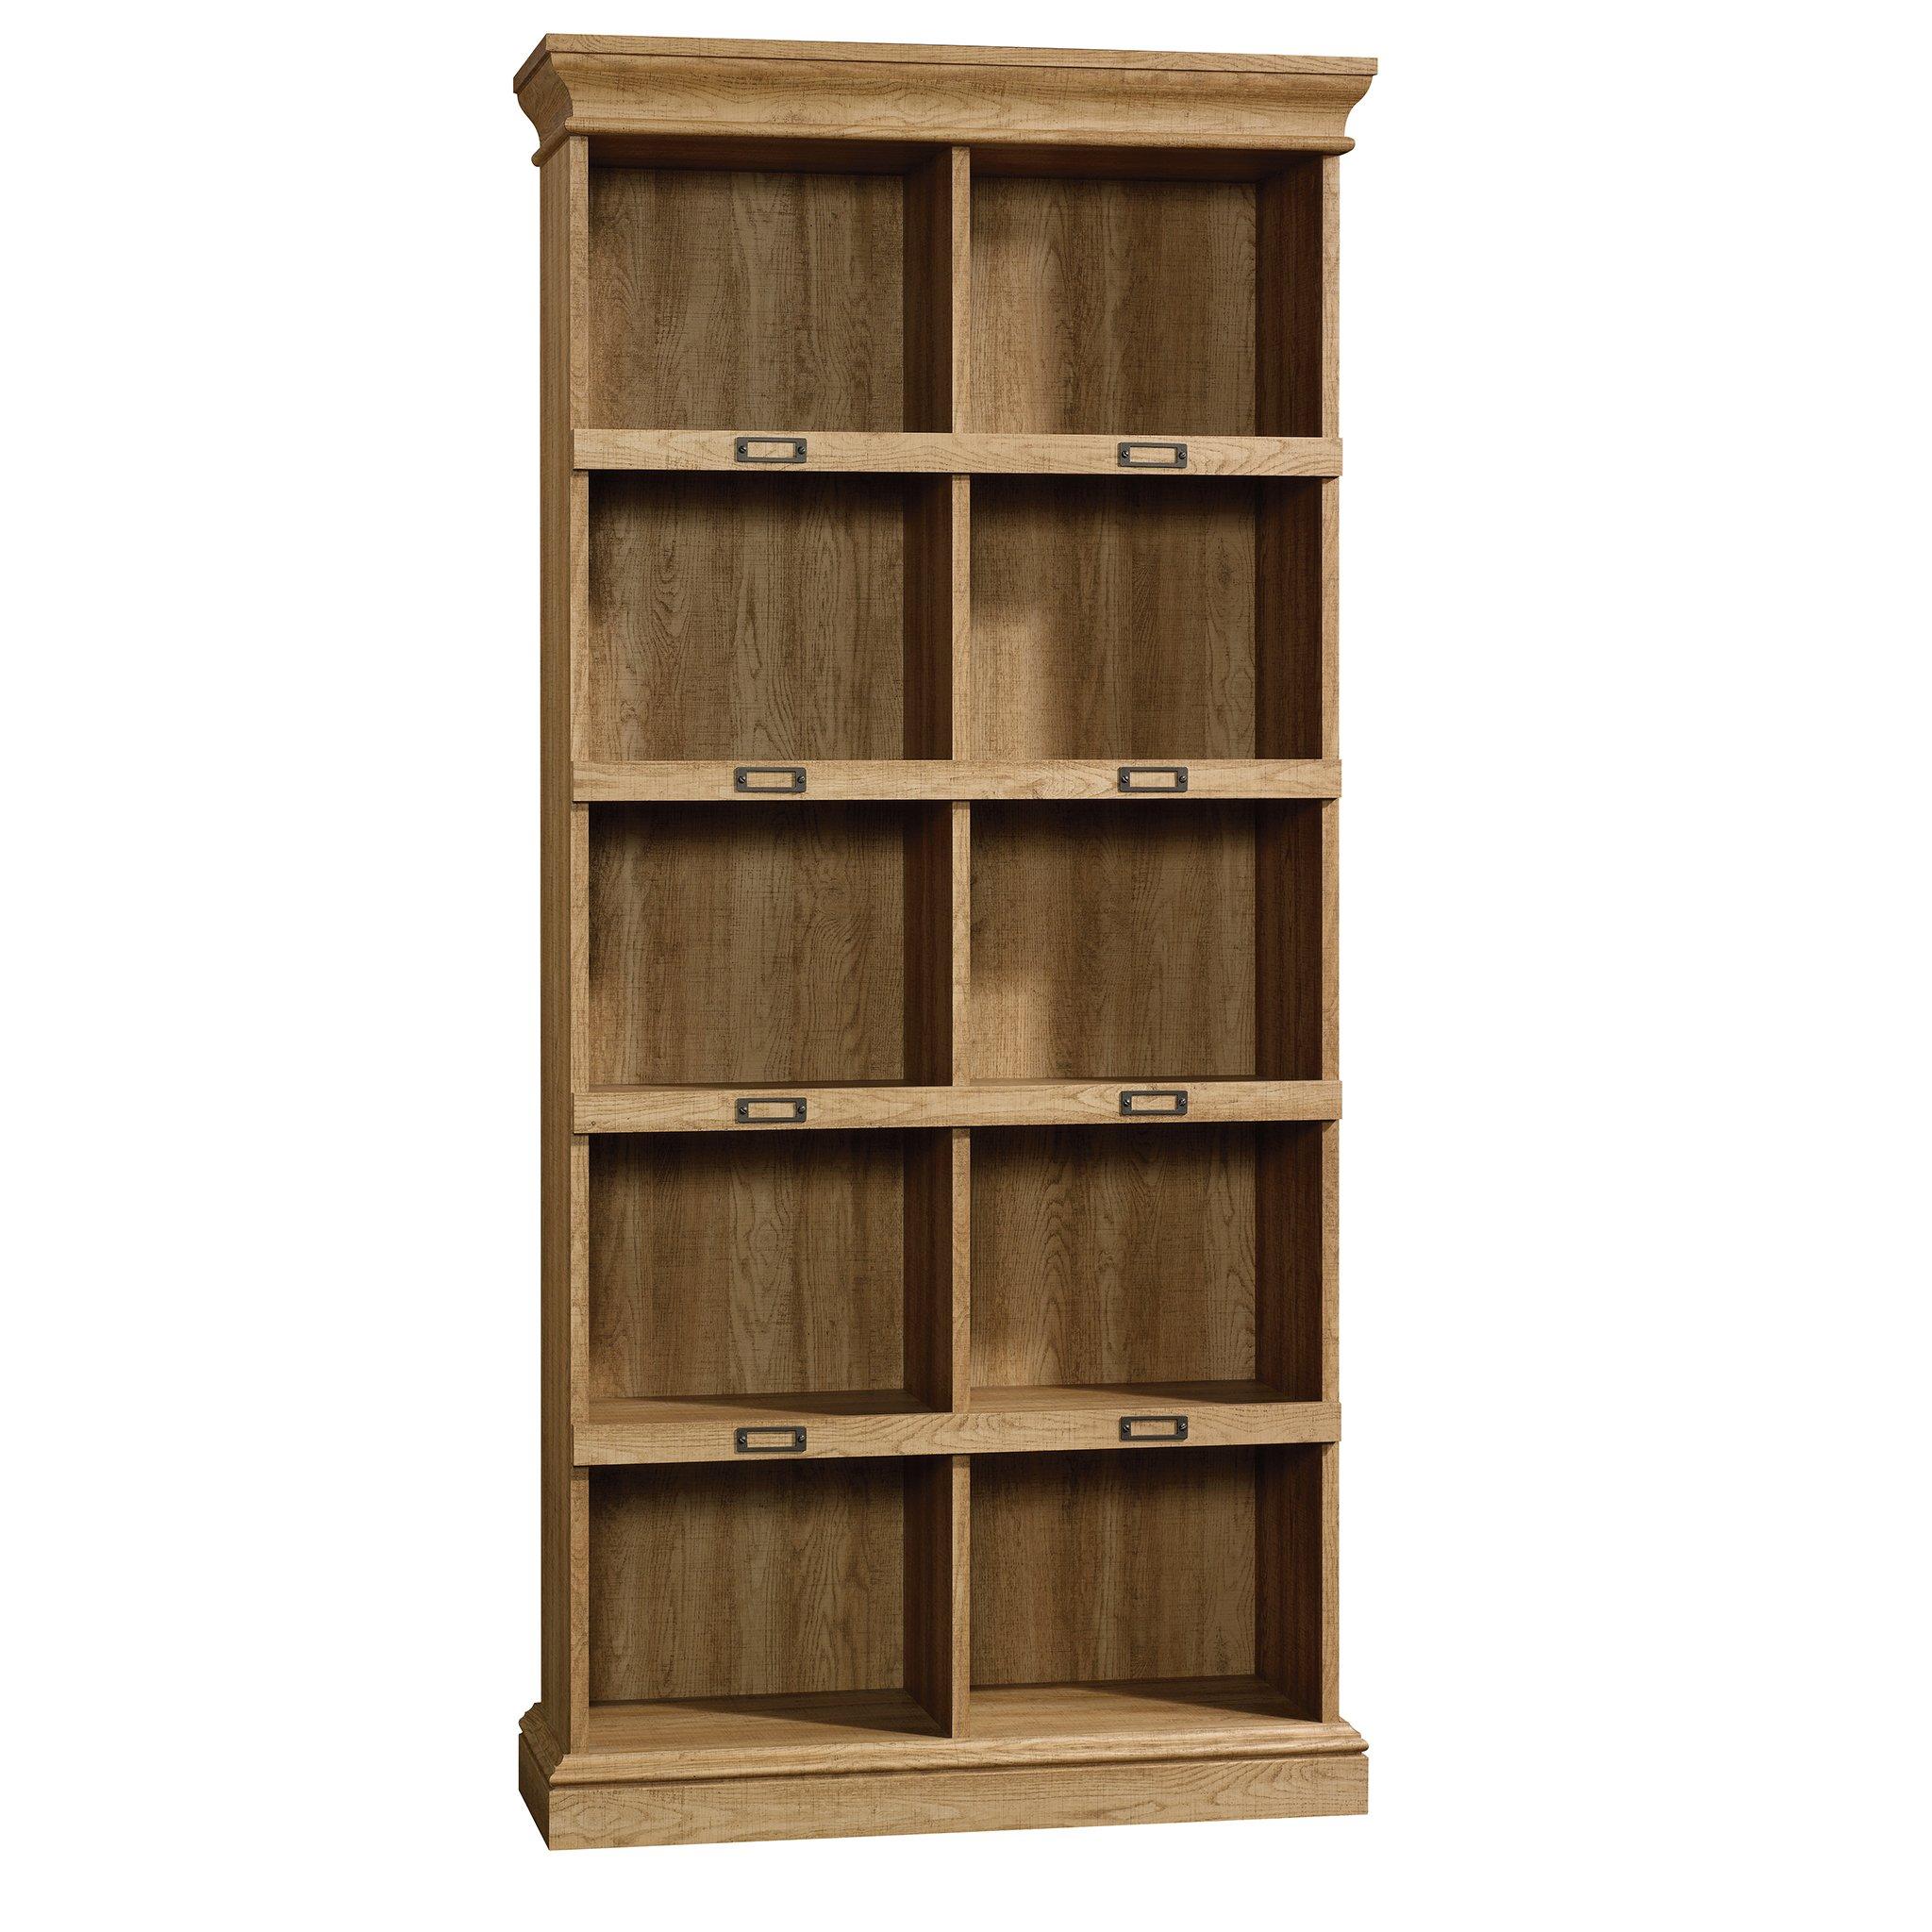 Sauder 414725 Barrister Lane Bookcase, L: 35.55'' x W: 13.50'' x H: 75.04'', Scribed Oak finish by Sauder (Image #1)